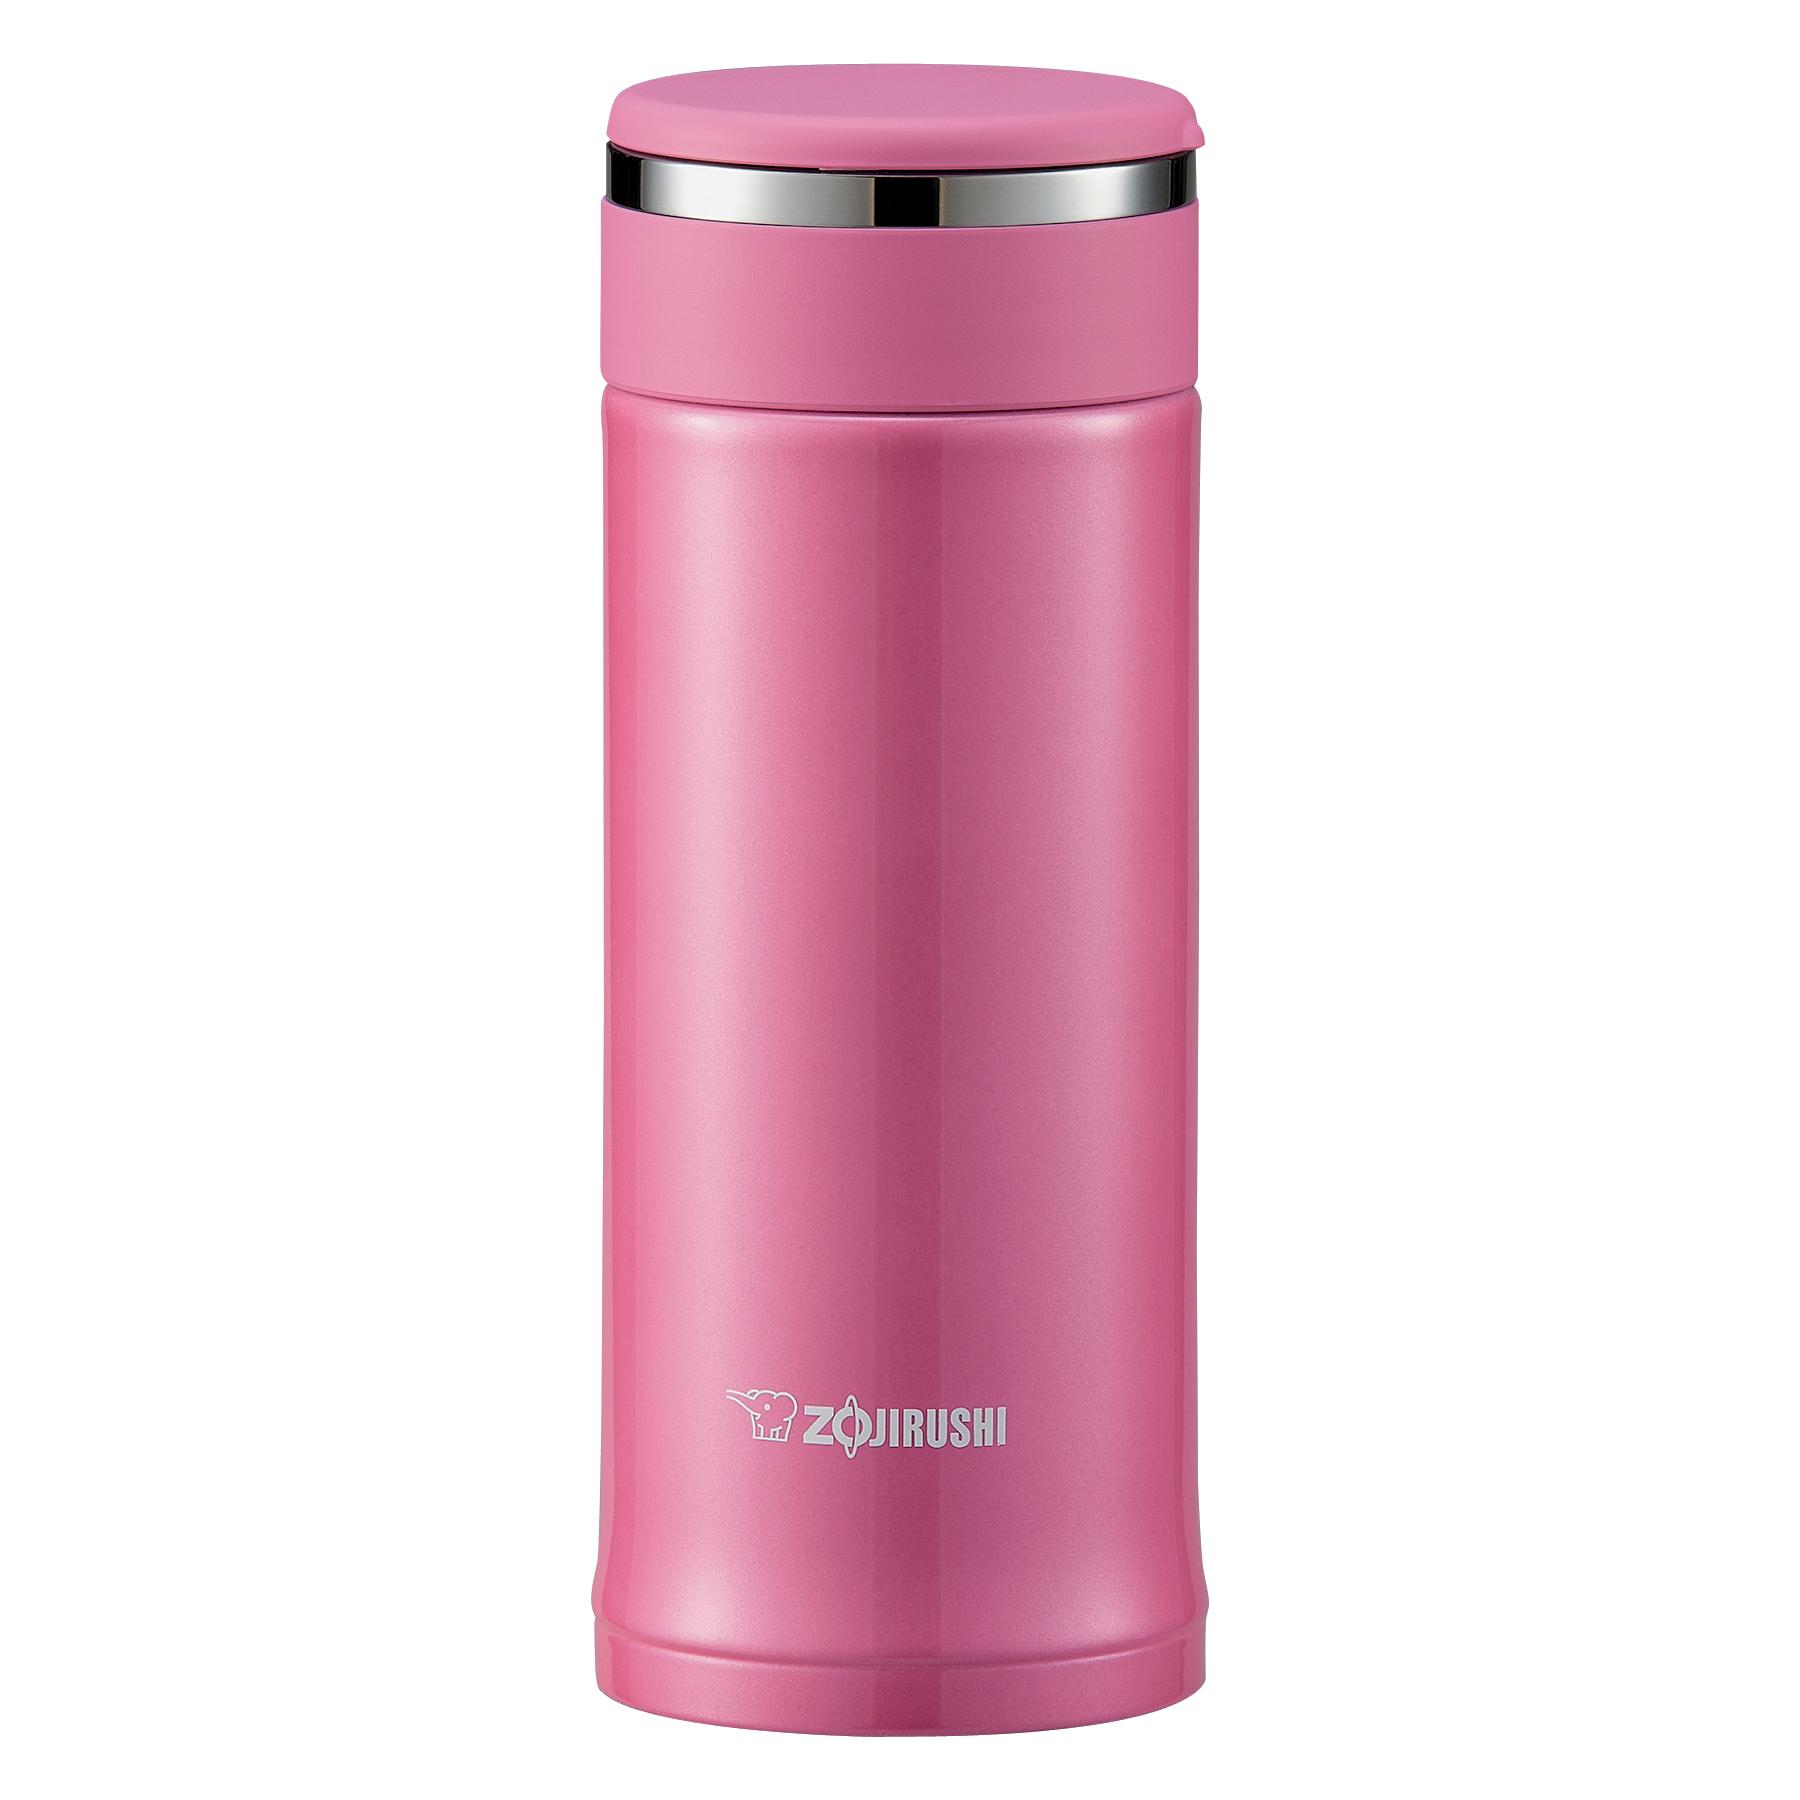 Zojirushi Tuff Pink Stainless Steel 12 Ounce Mug